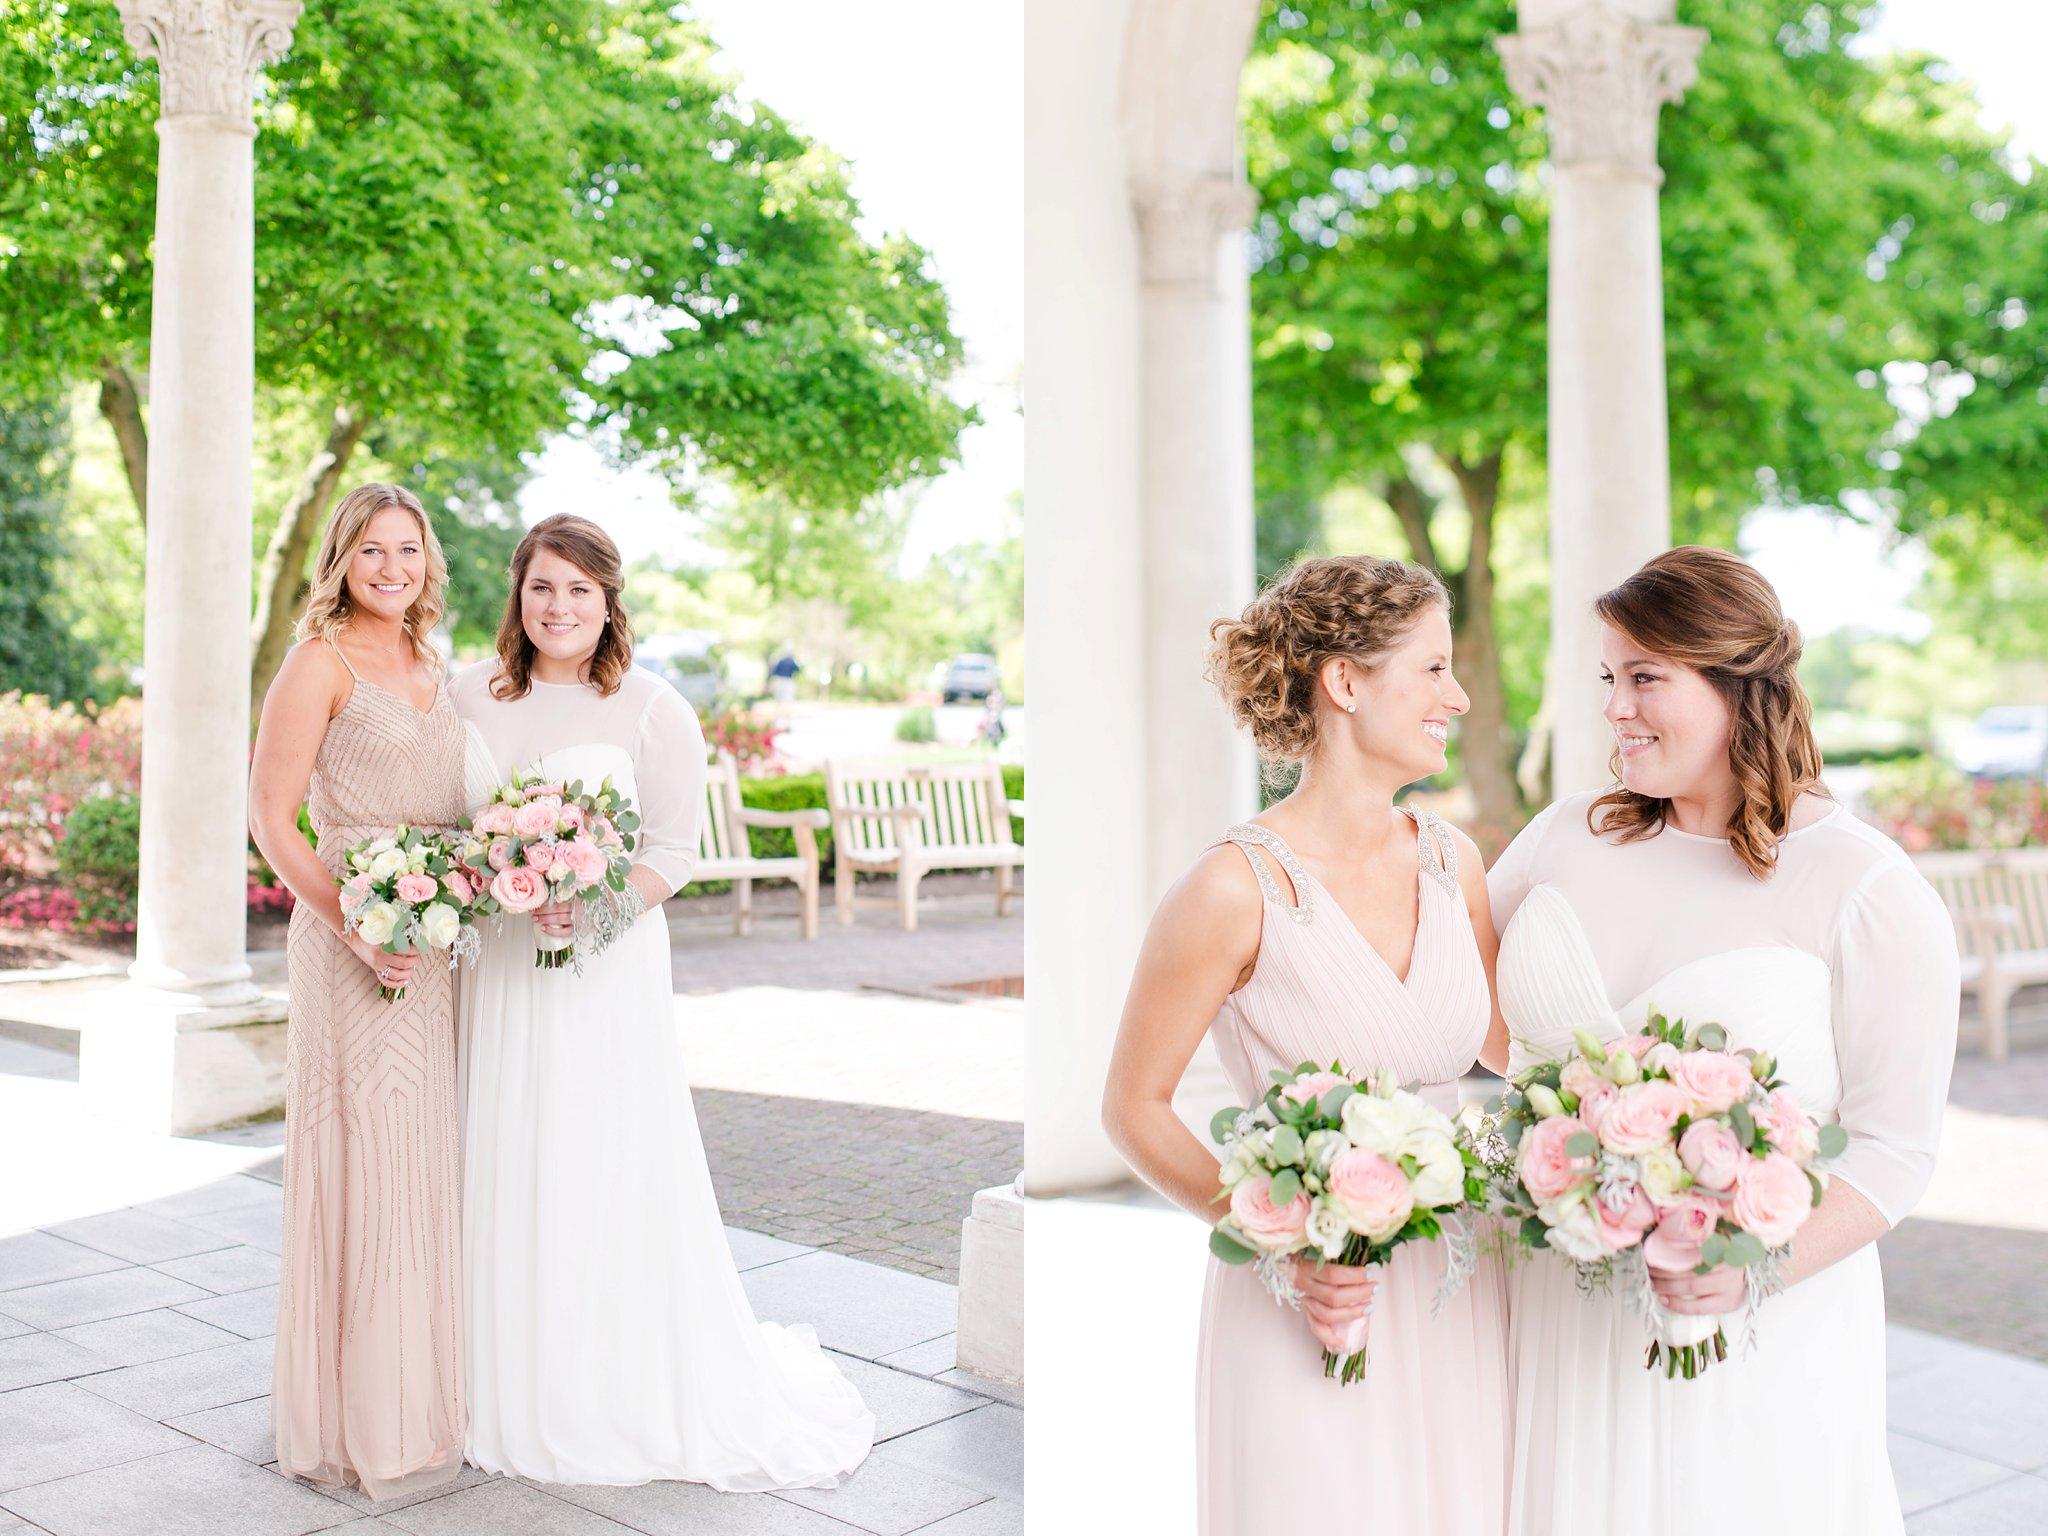 Congressional Country Club Wedding Photos DC Maryland Wedding Photographer Megan Kelsey Photography Kelly & Andrew-156.jpg